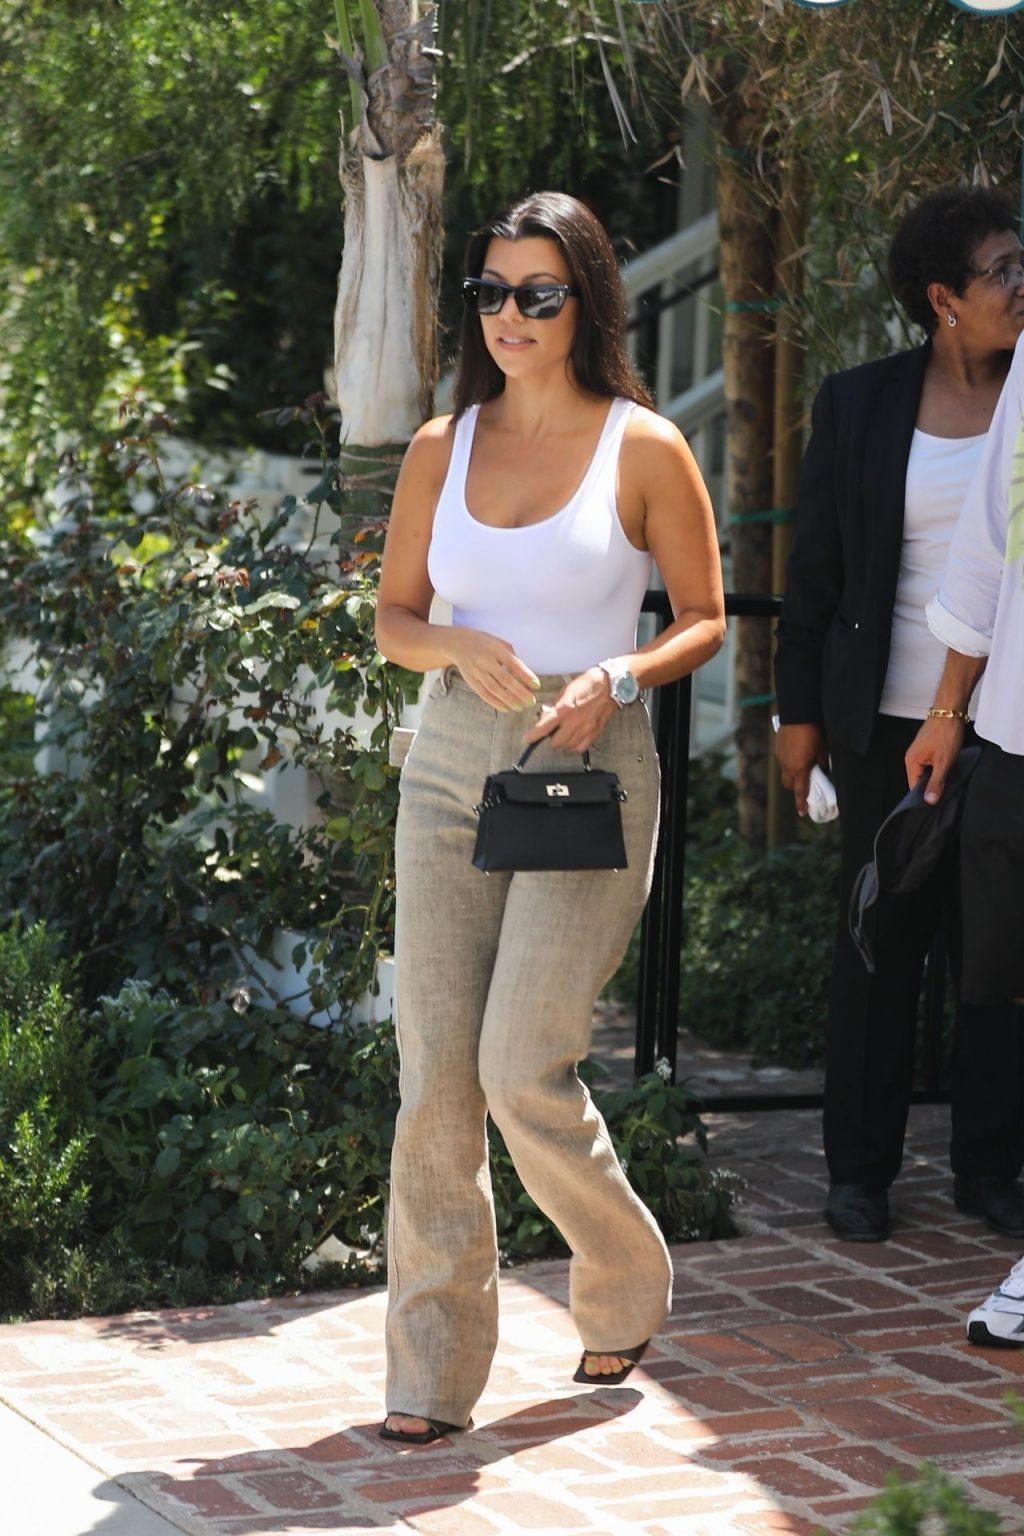 Kourtney Kardashian See Through Thefappeningblog Com 69 1024